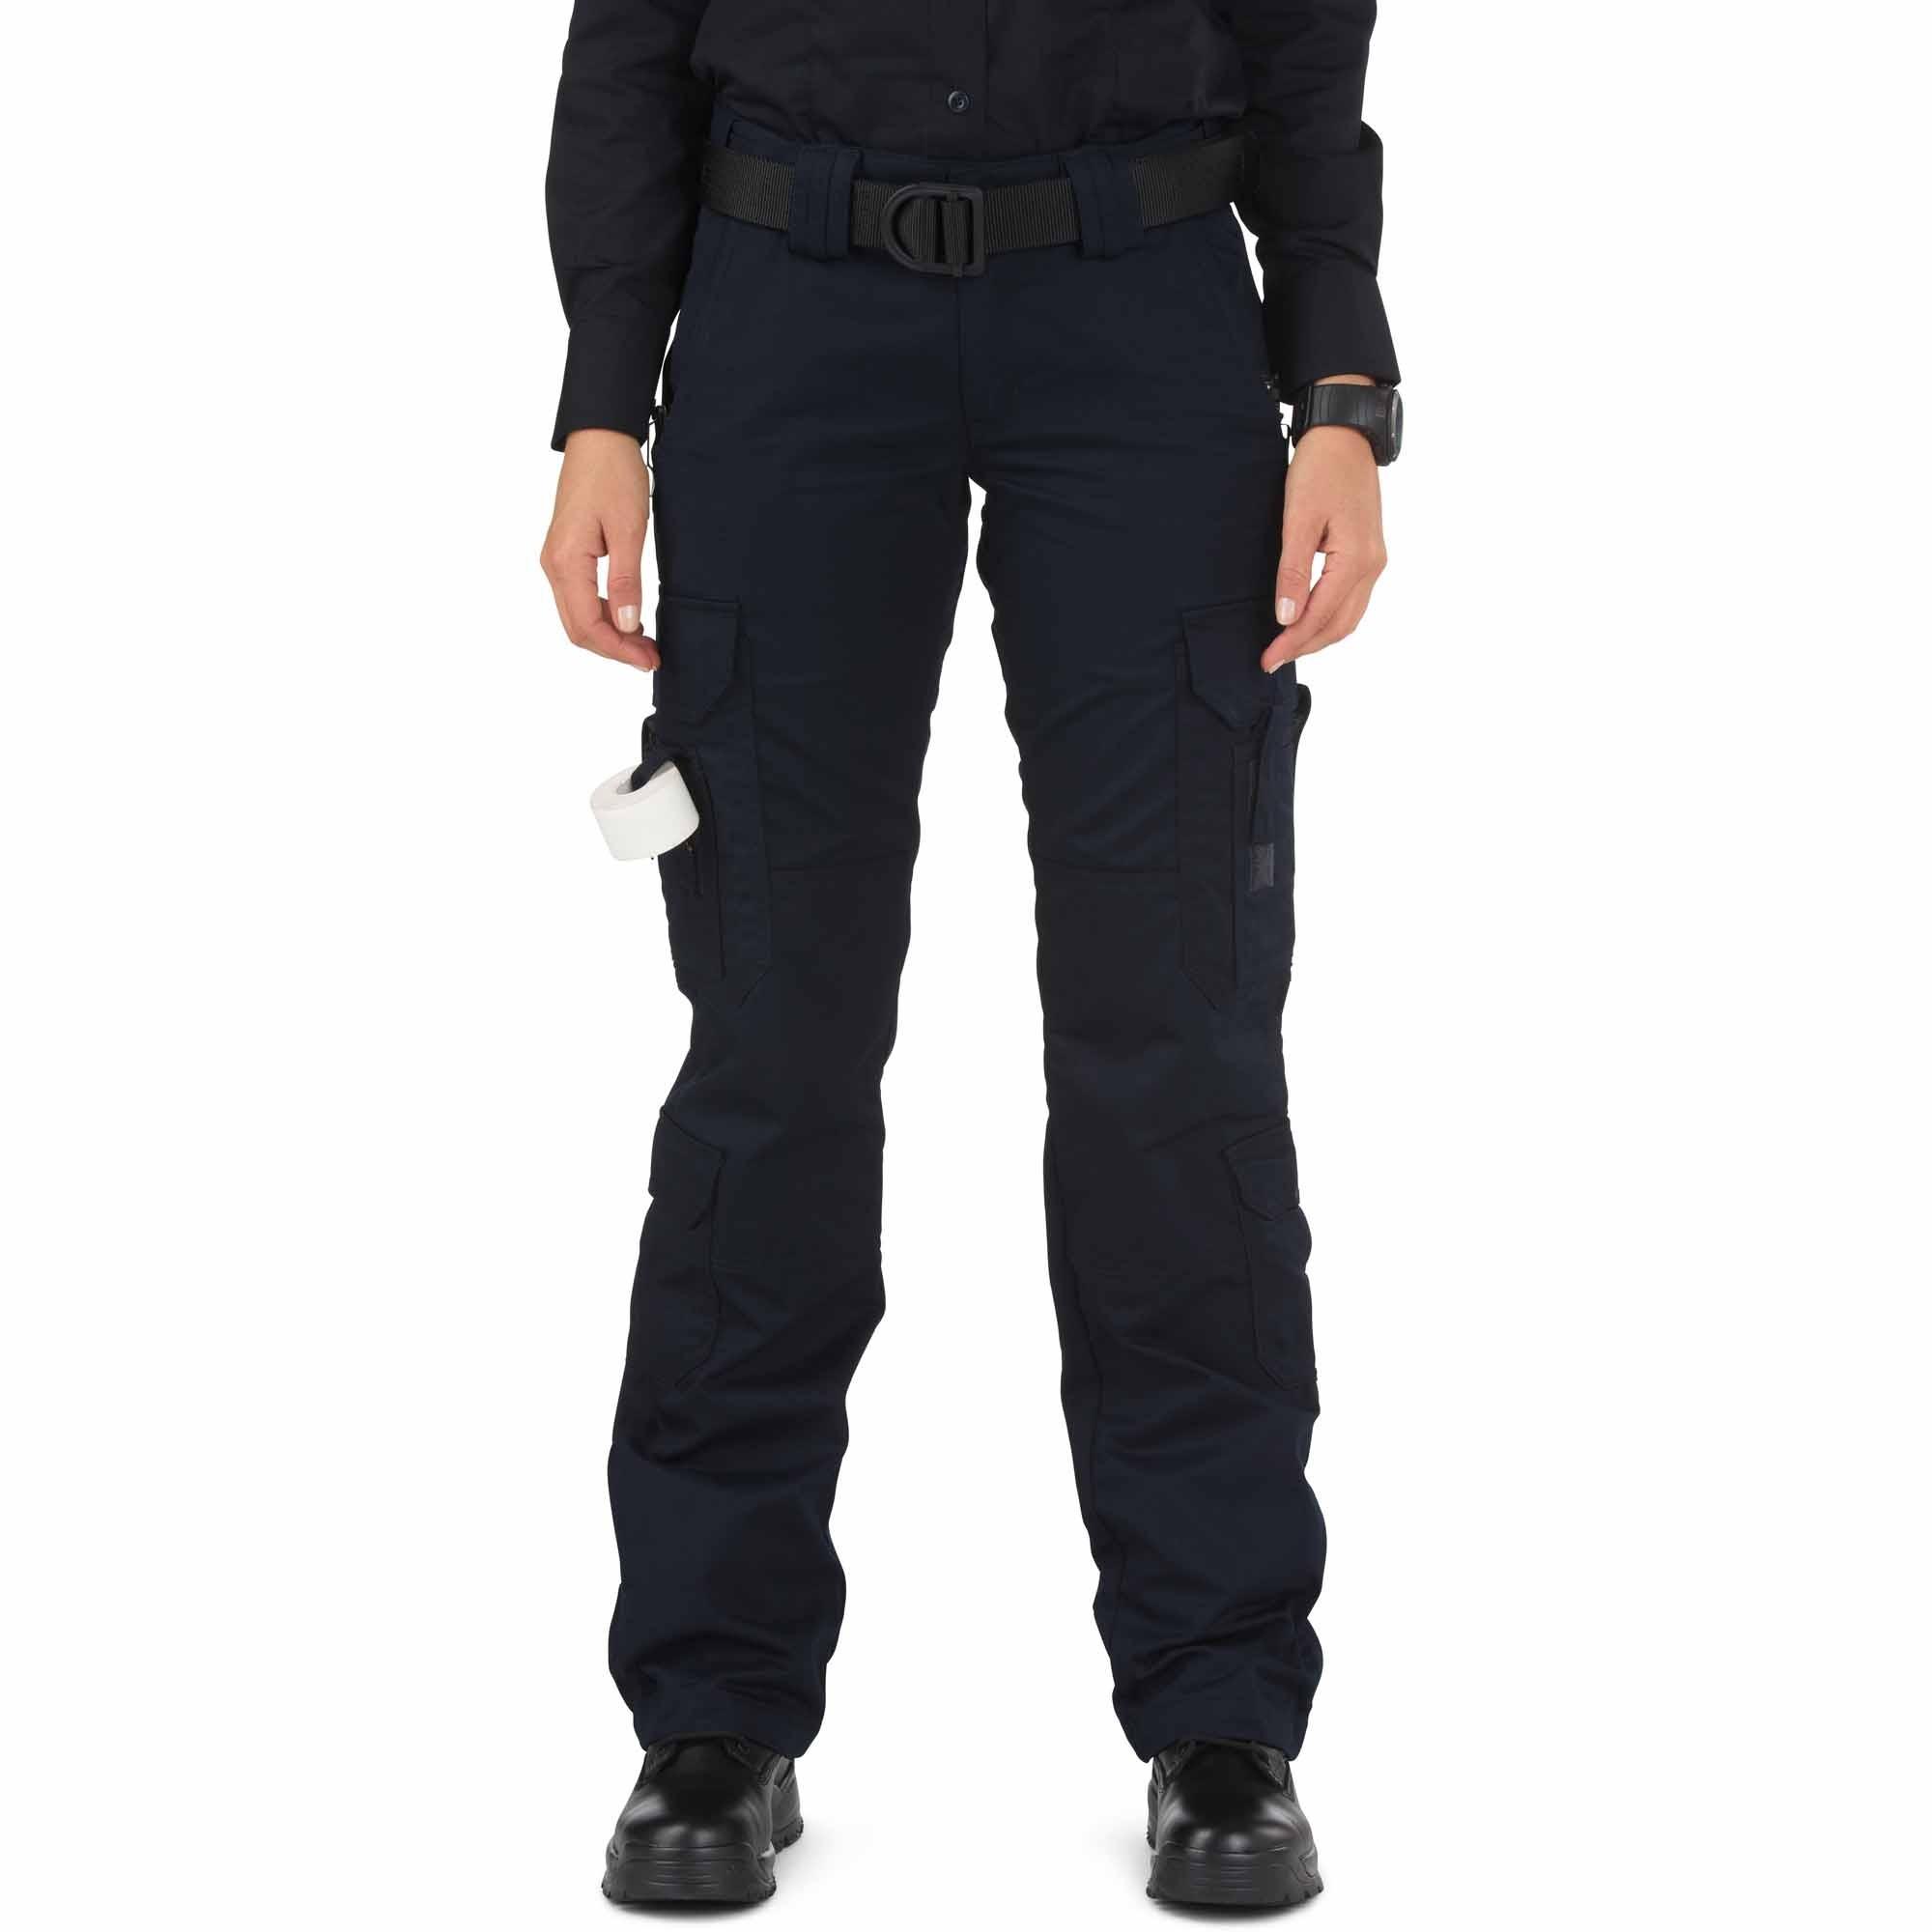 5.11 Tactical Women's Taclite EMS Pant 64369